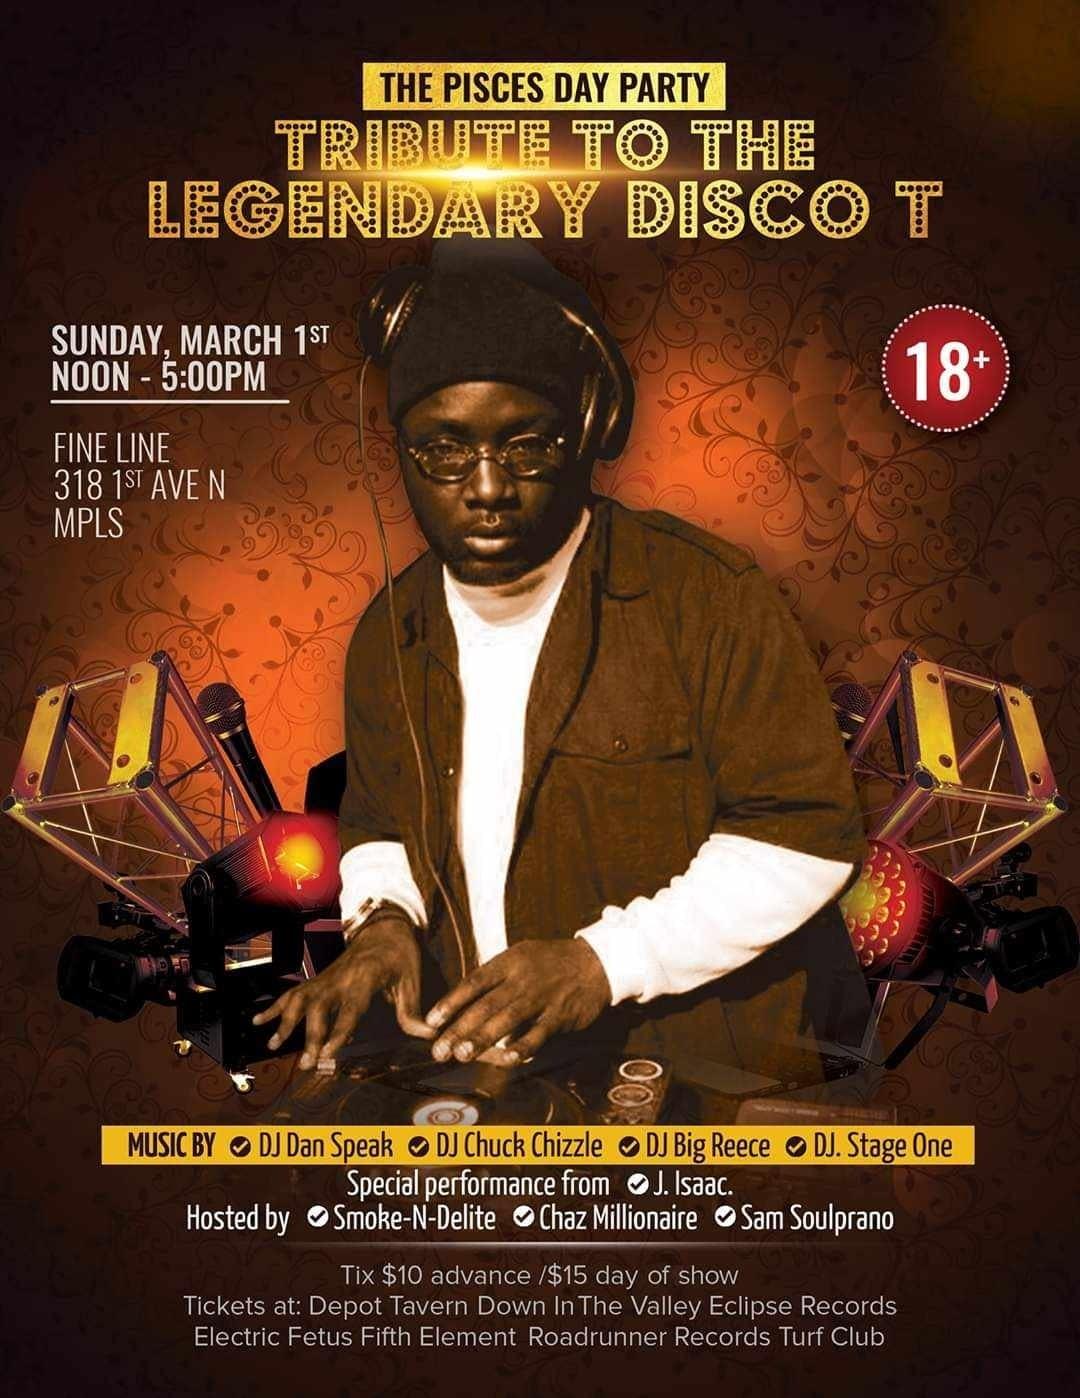 Disco T tribute show artwork